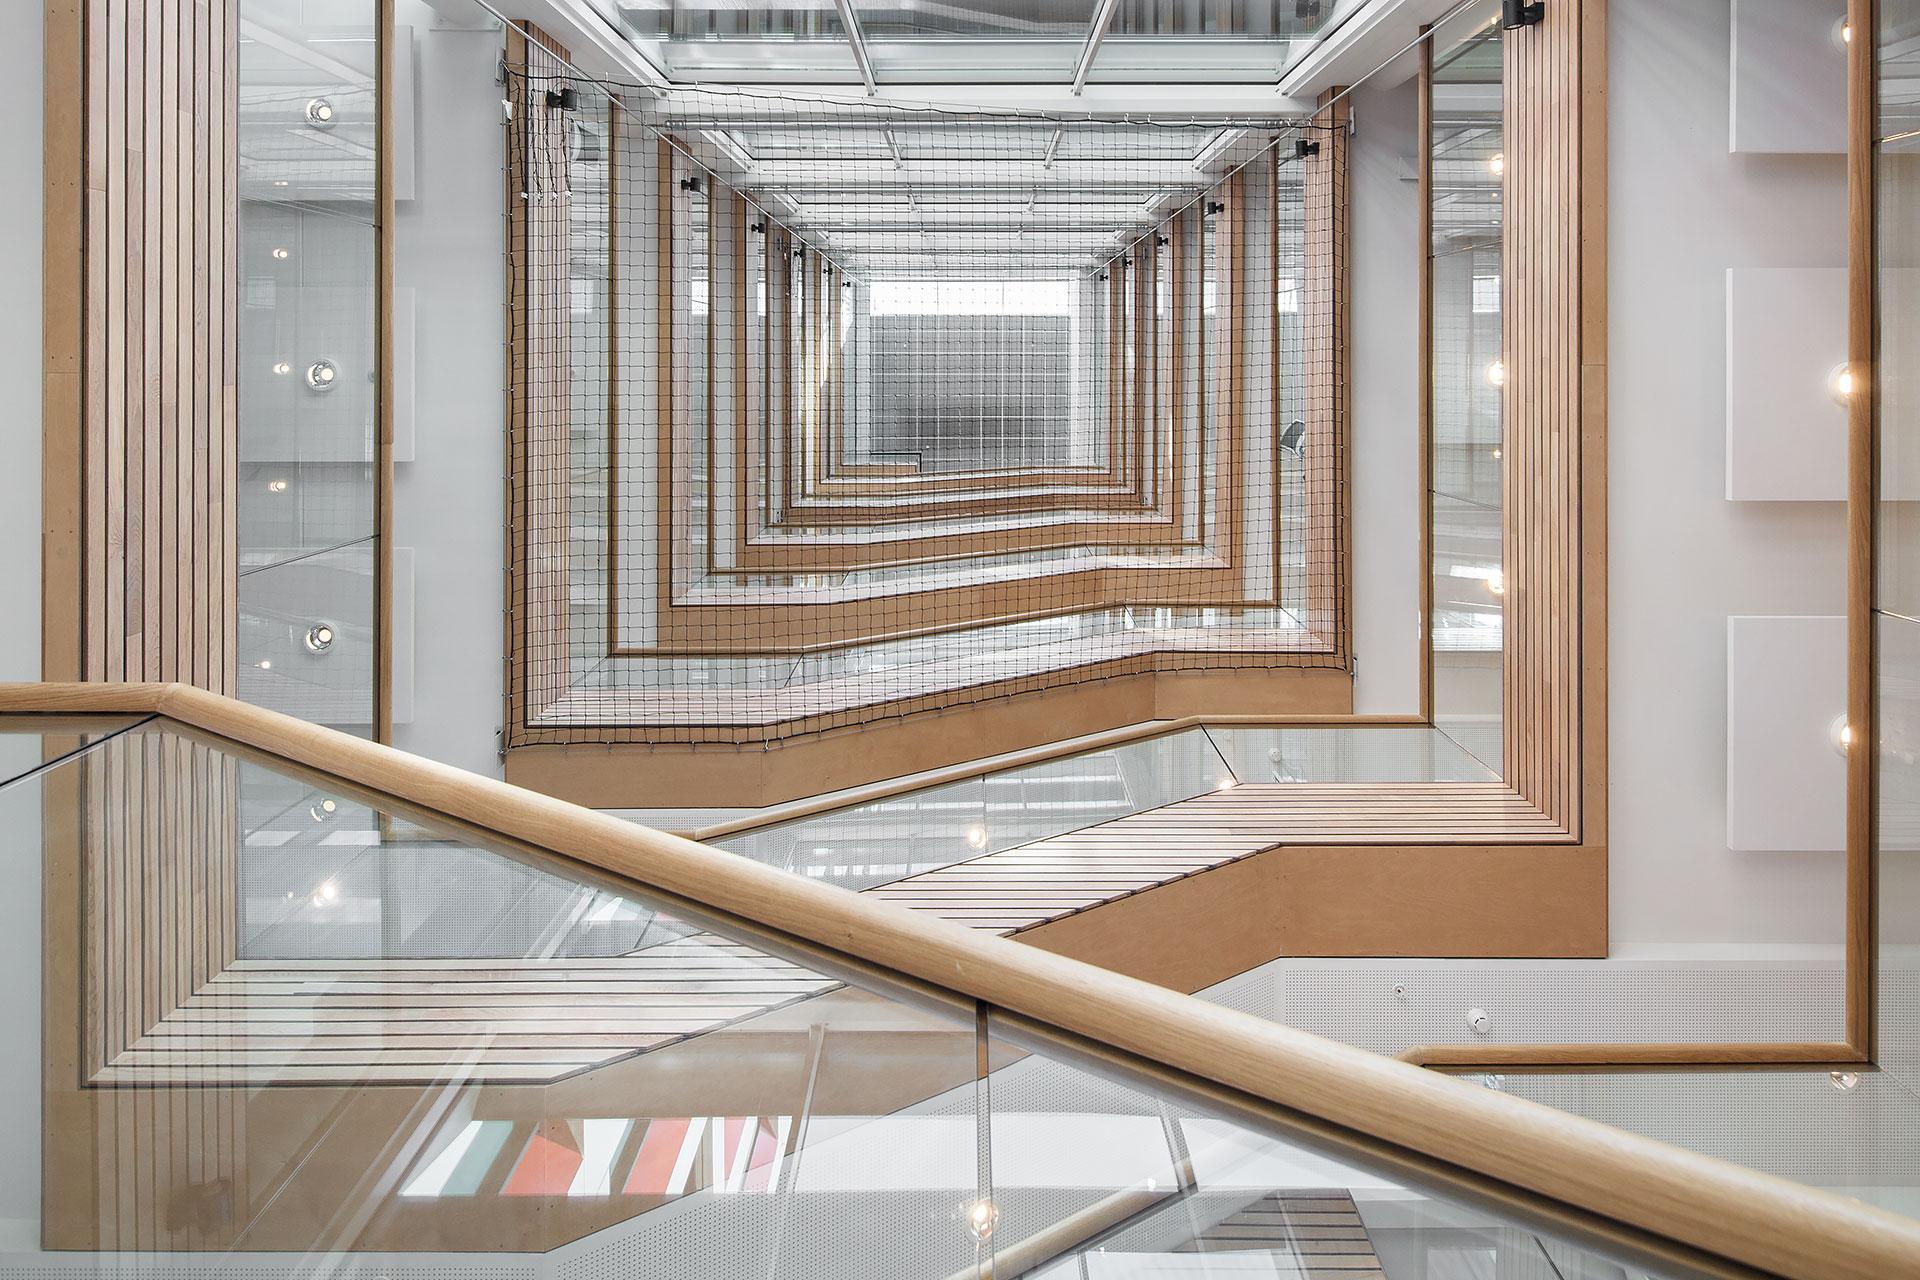 SP2015-Stadhuis-Almelo-architectuurfoto-16